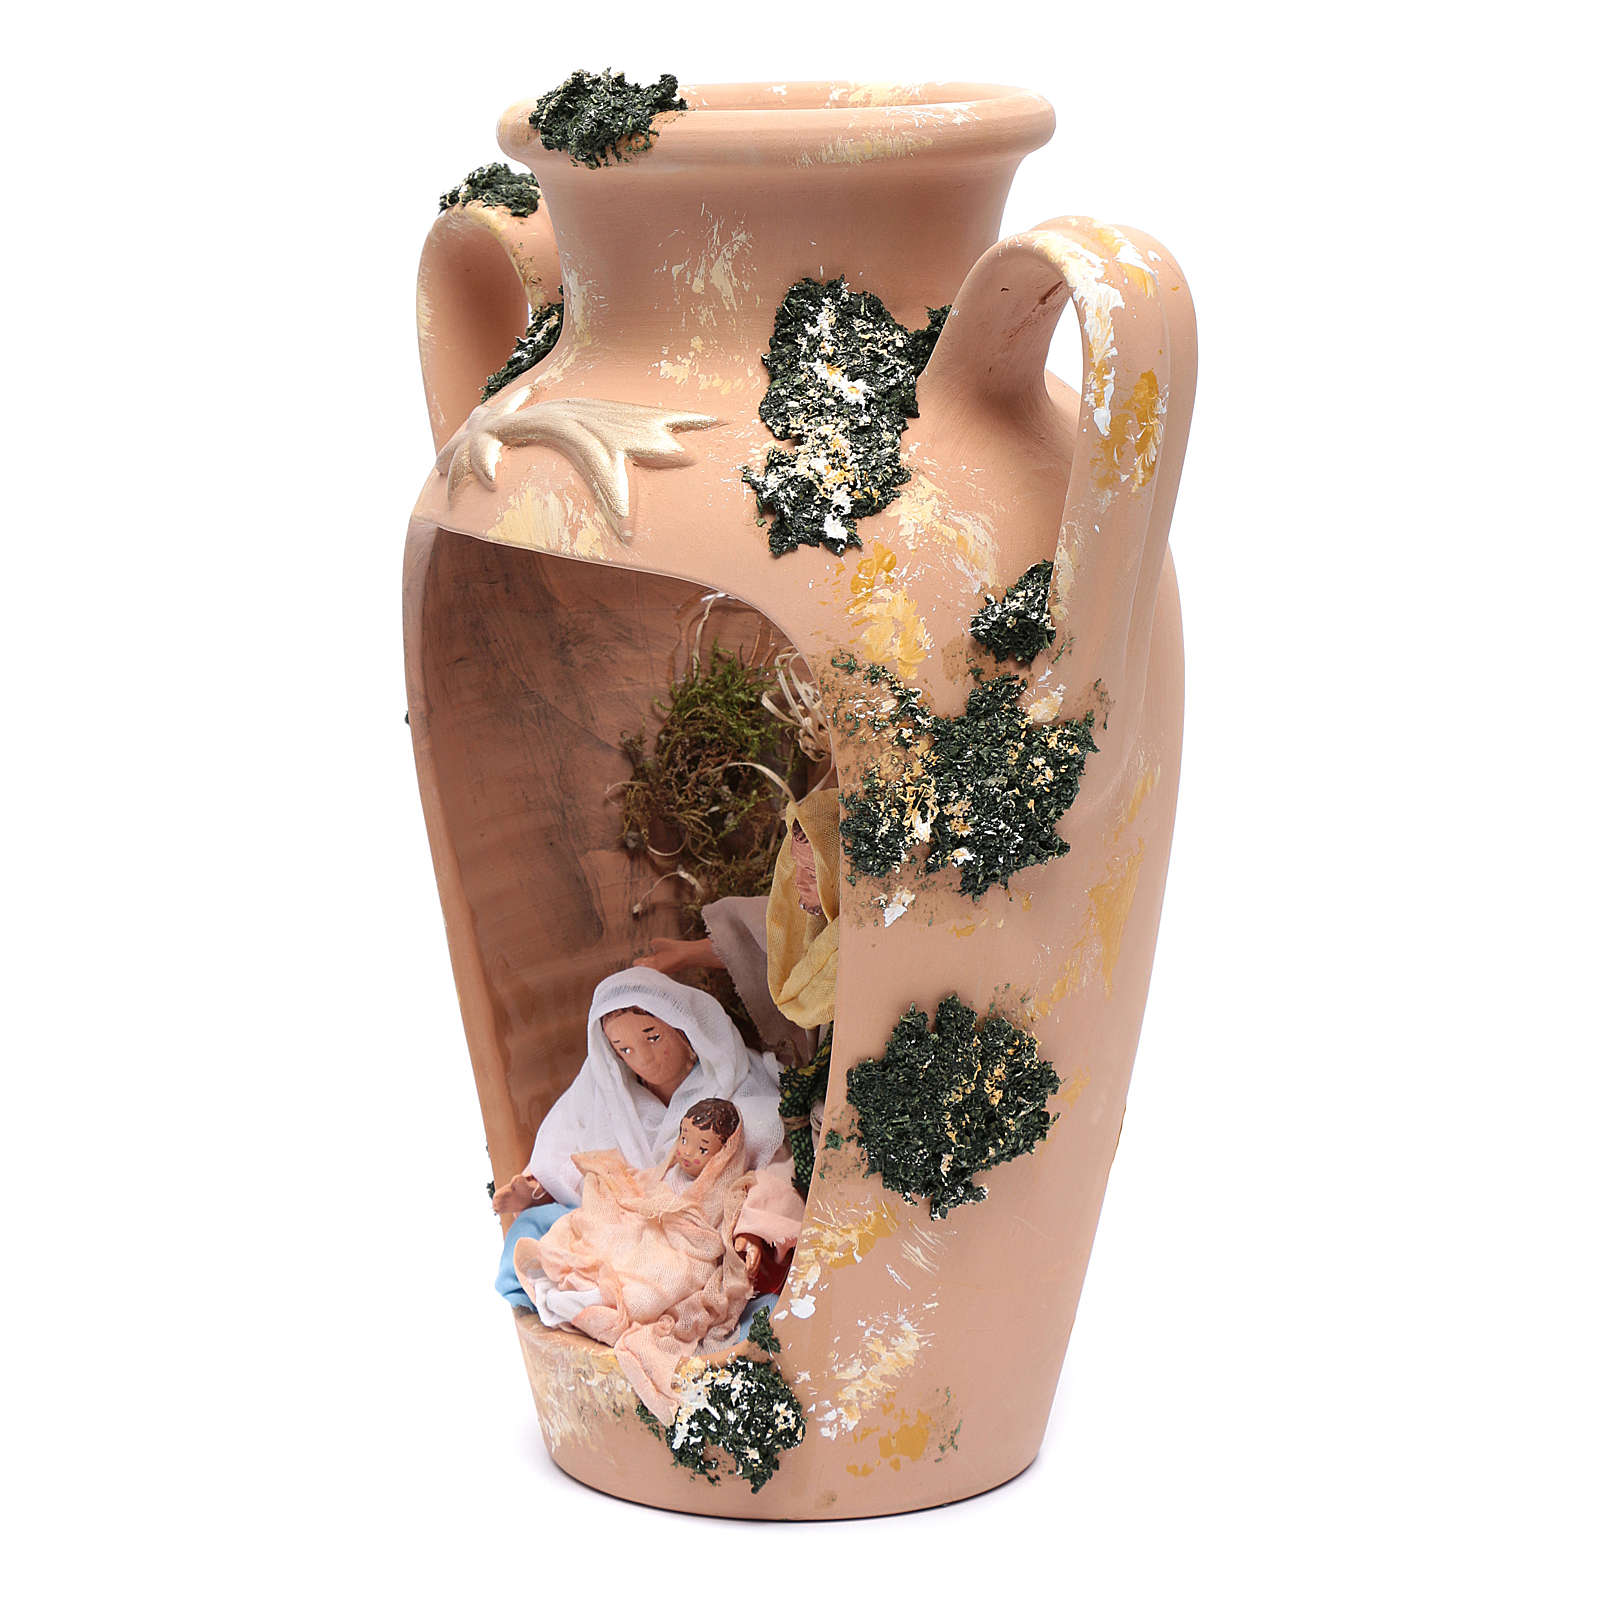 Natività 16 cm nel vaso a due manici terracotta Deruta 35 cm 4